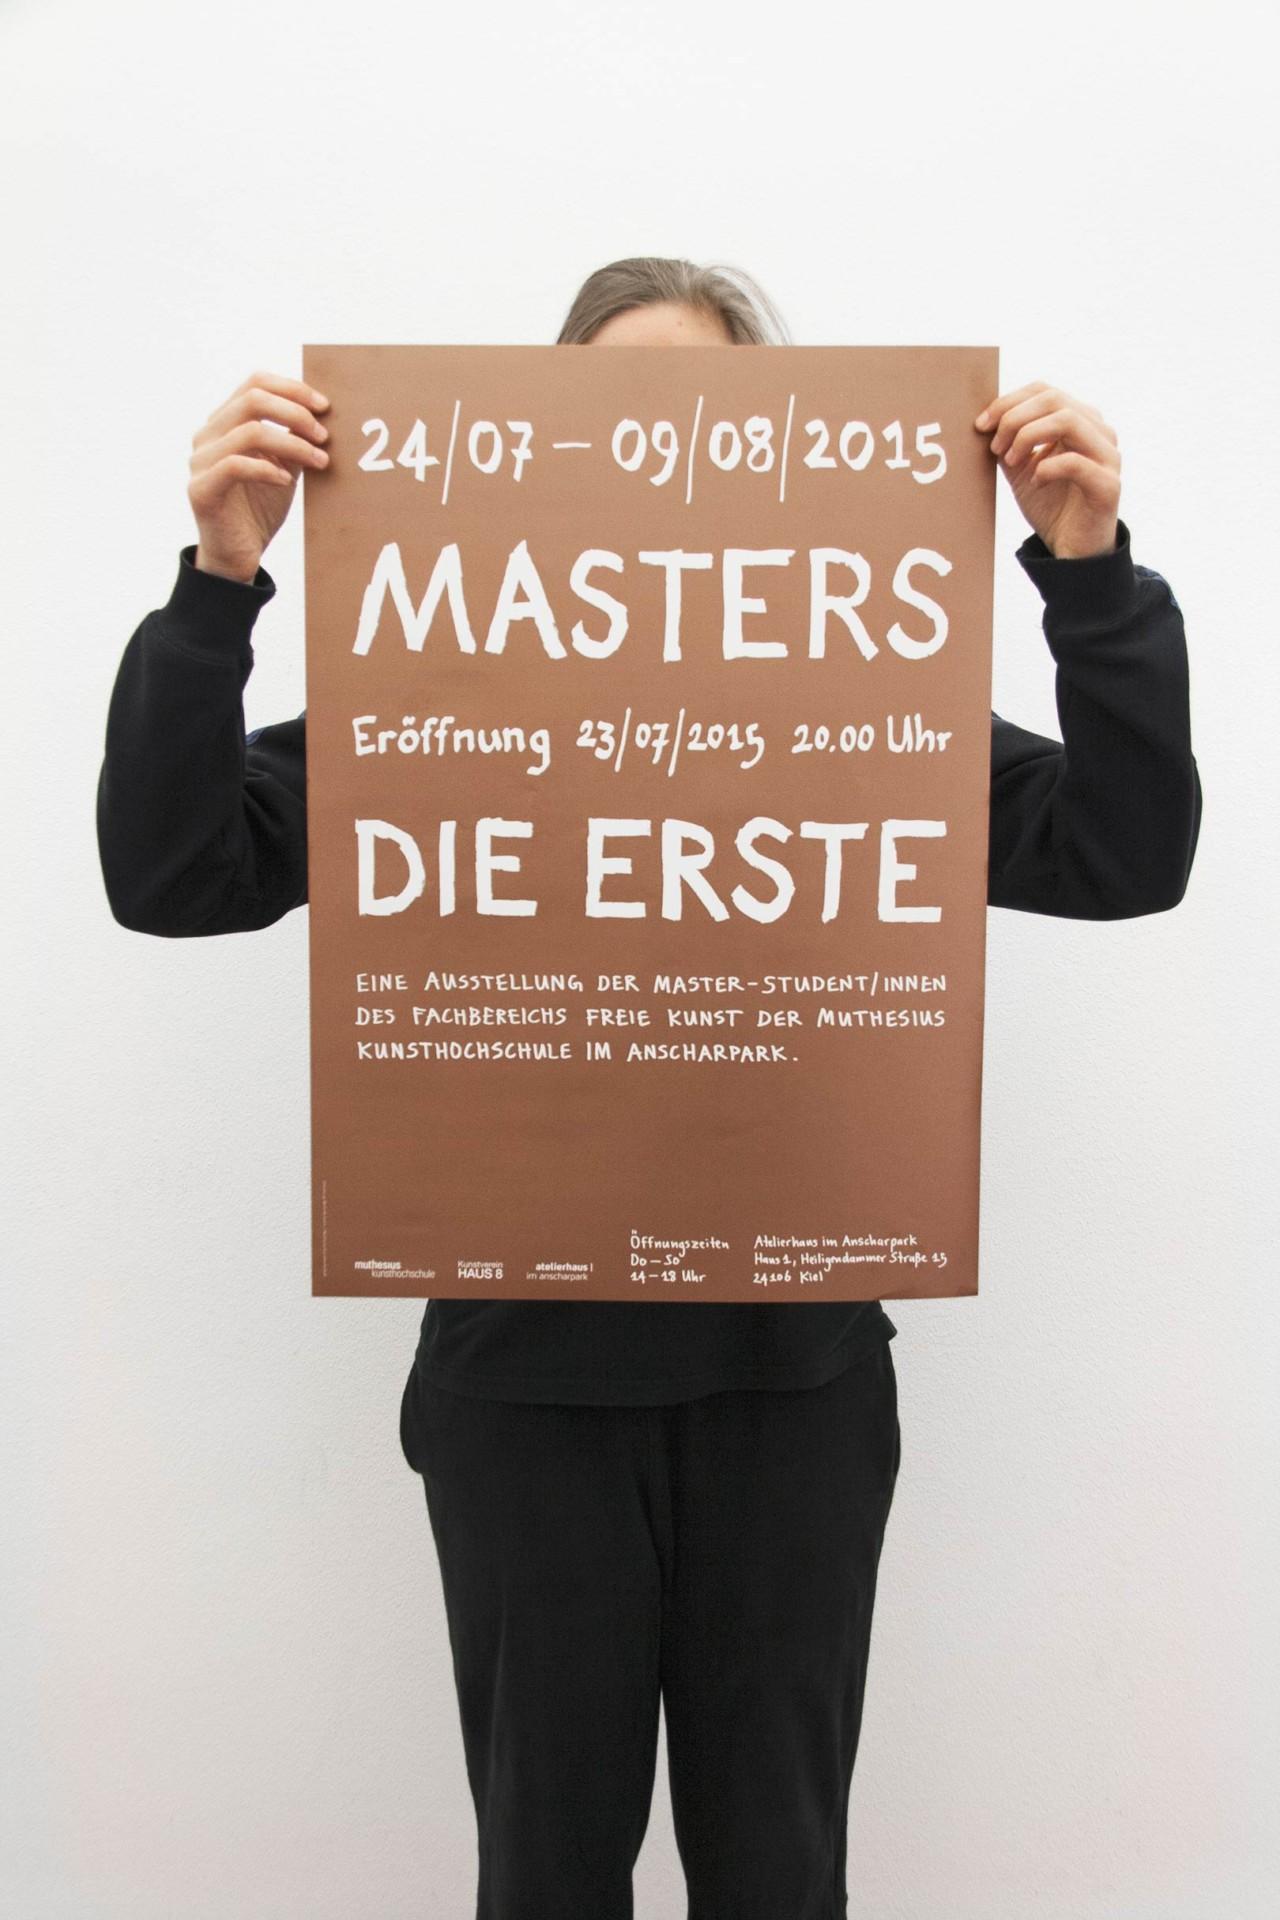 Merle Michaelis / Lettering & Typografie Masters